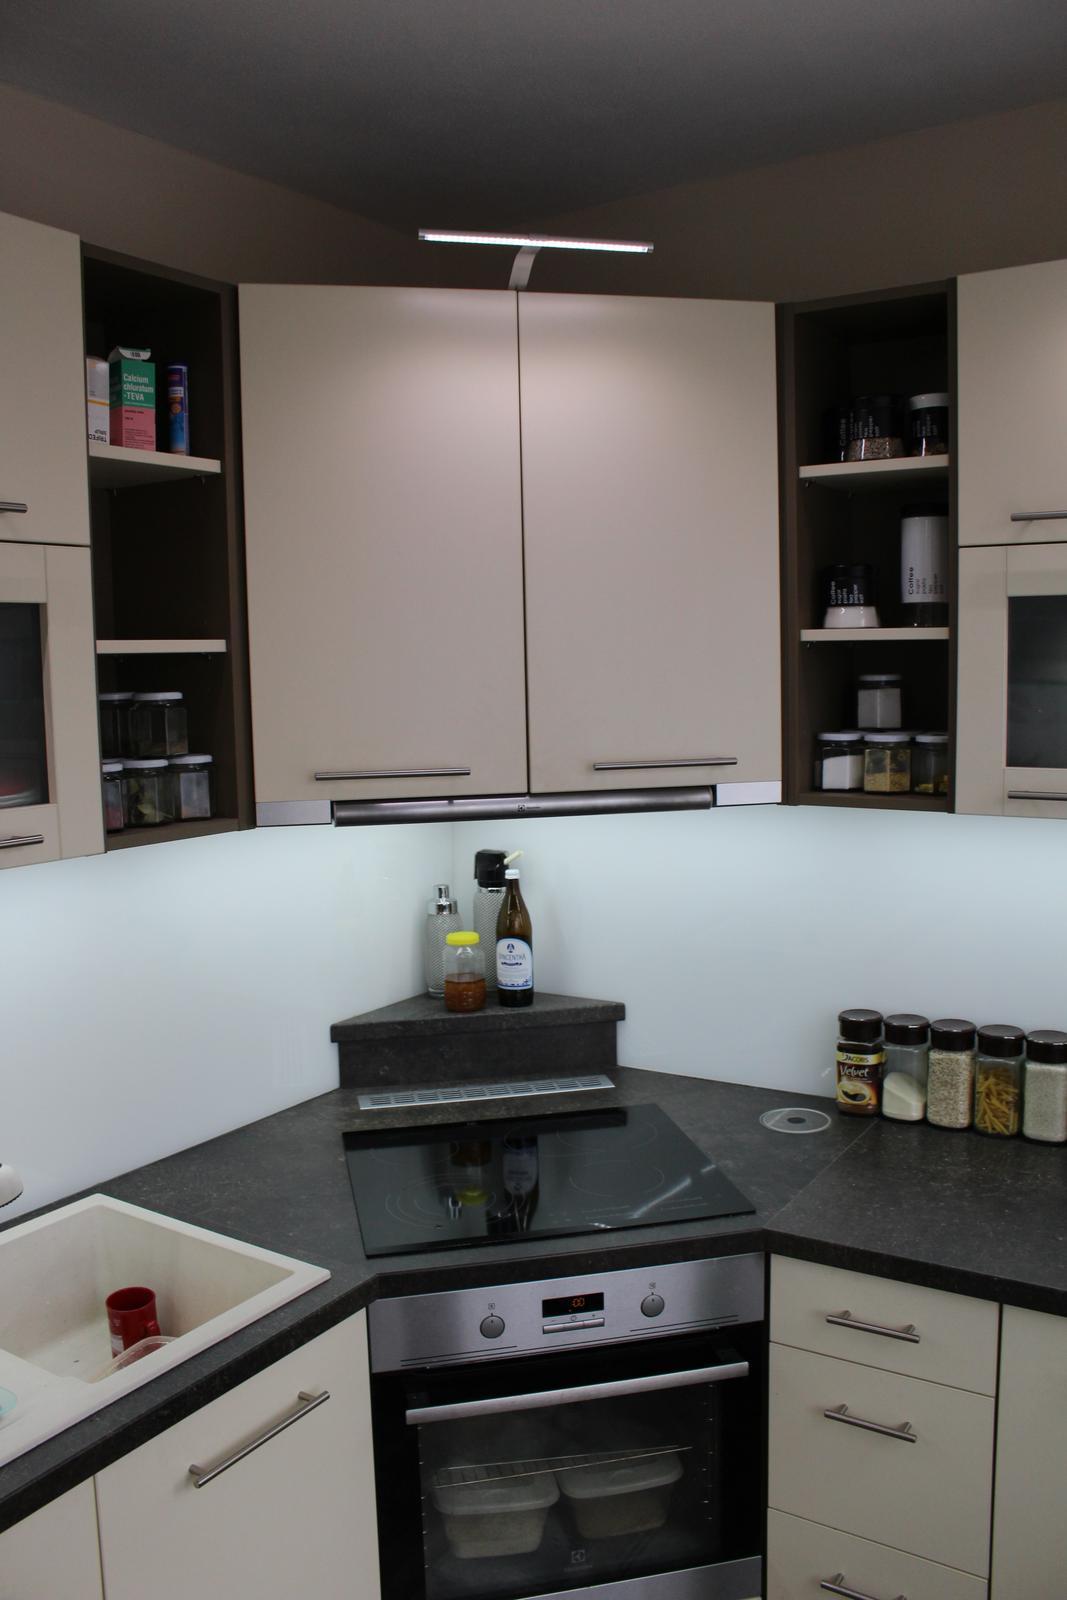 Realizácie kuchyne - Marek Herko-stolárstvo - Kuchynská linka robená do paneláku